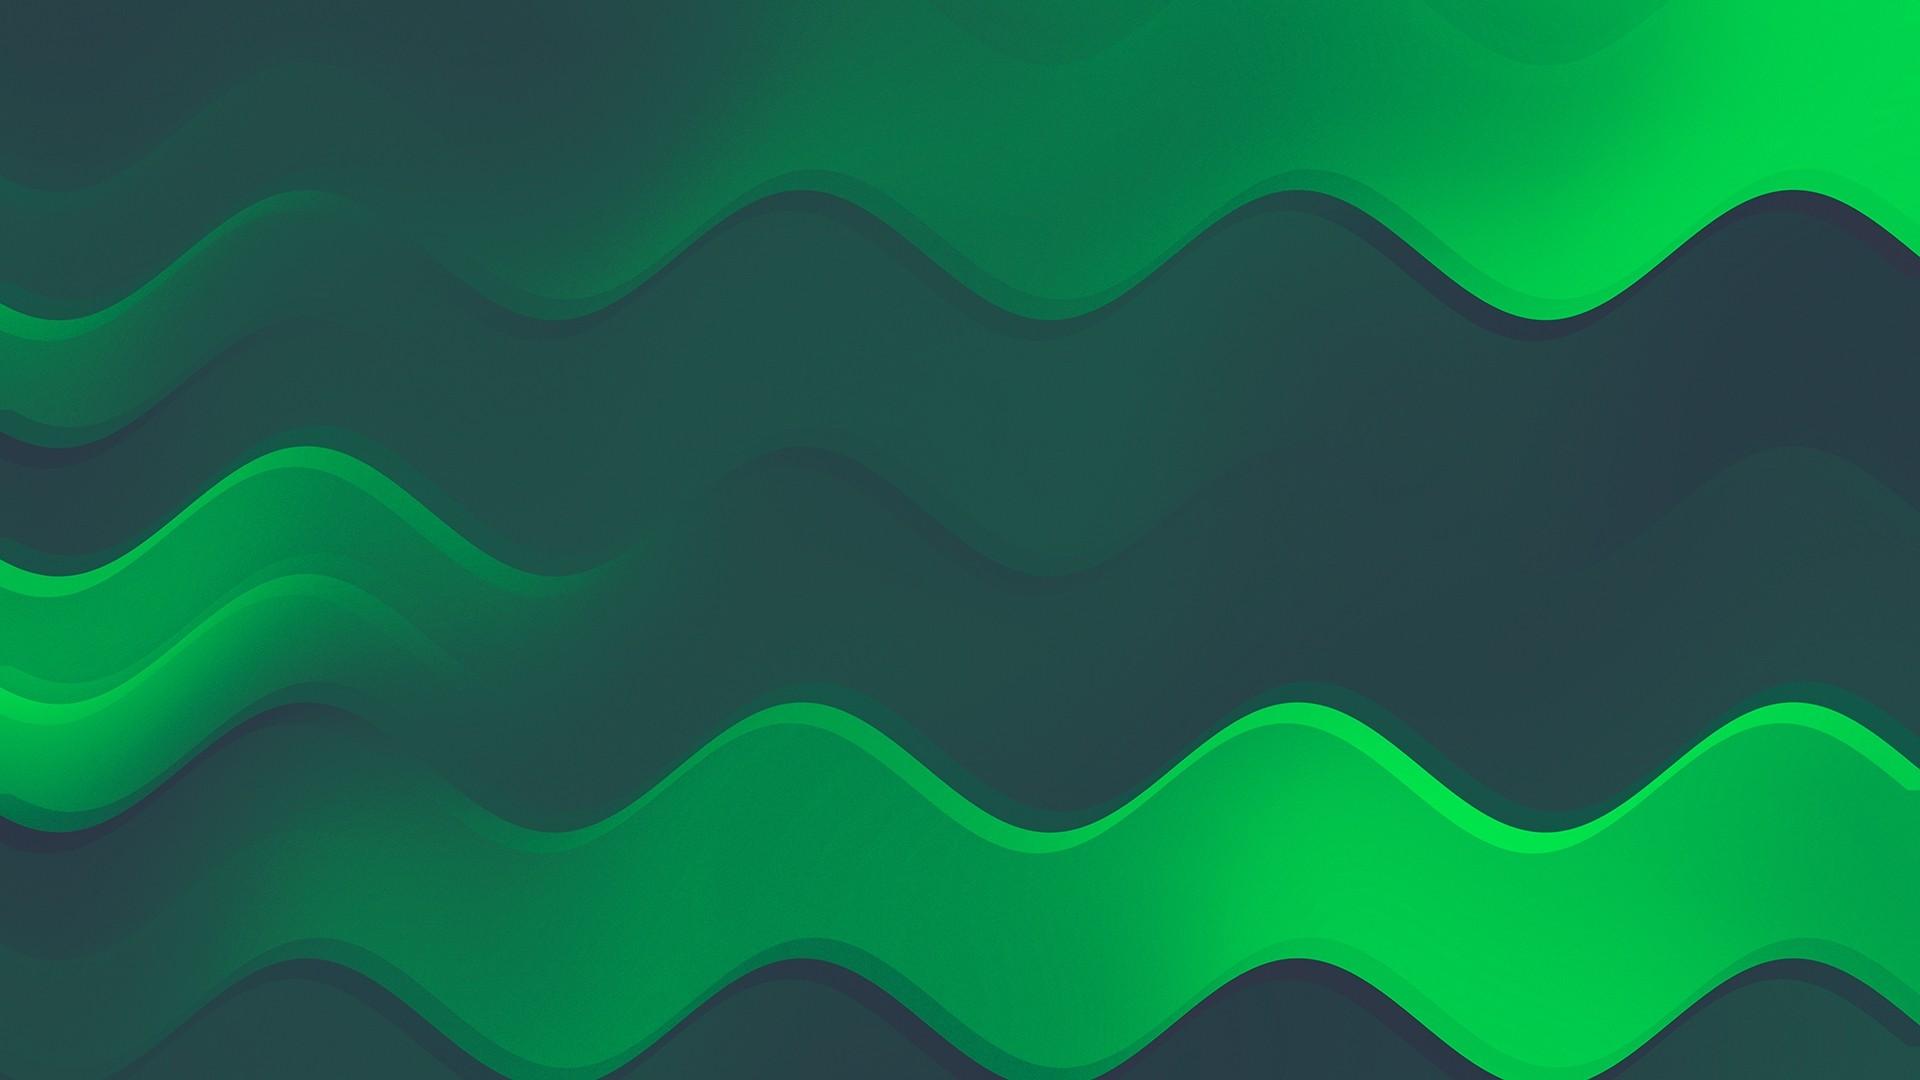 Chromebook Desktop Wallpaper